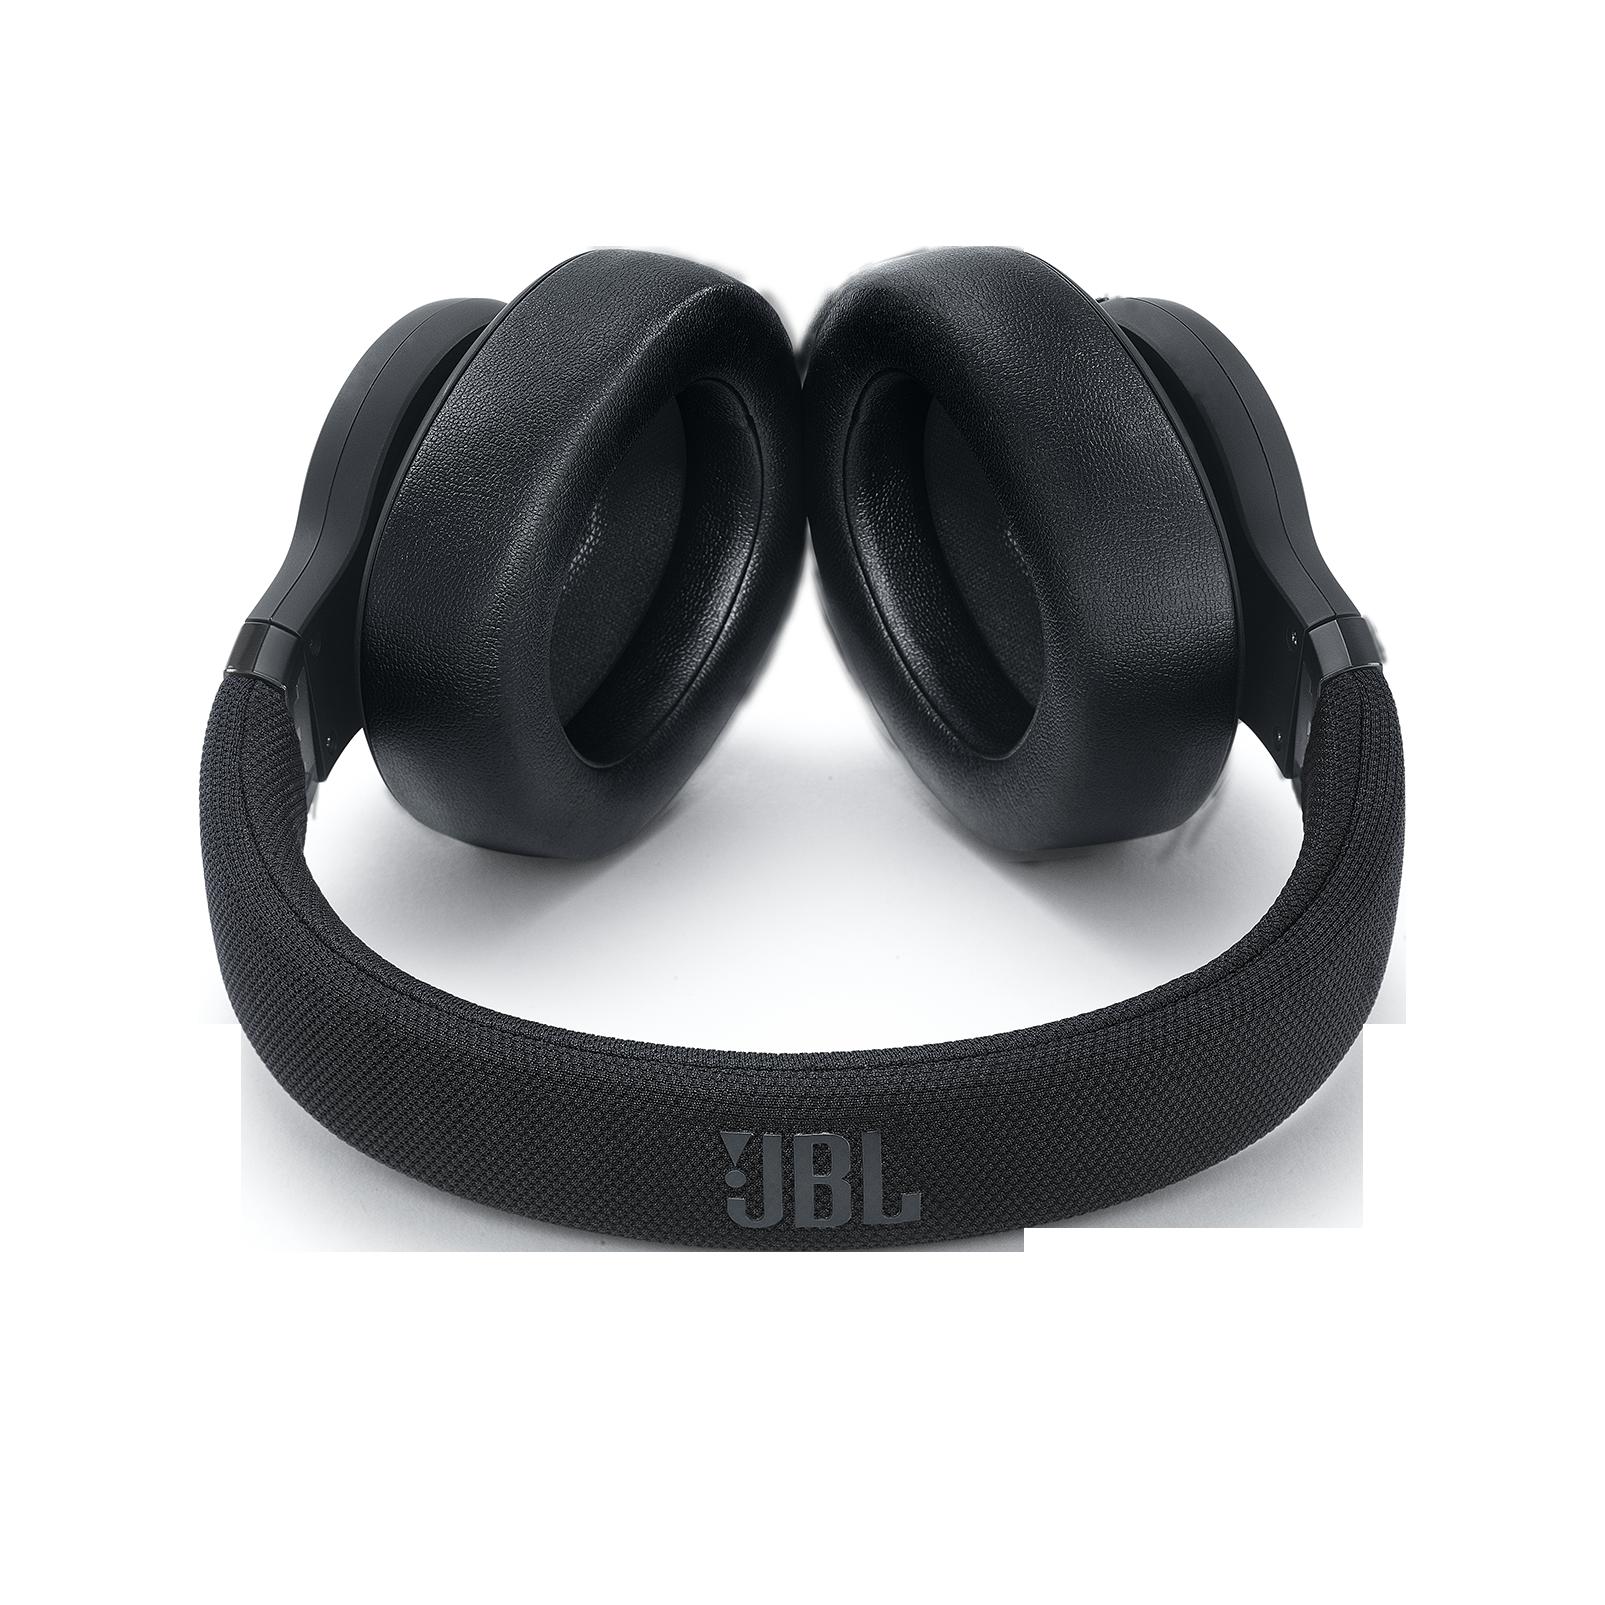 JBL E65BTNC - Black Matte - Wireless over-ear noise-cancelling headphones - Detailshot 1